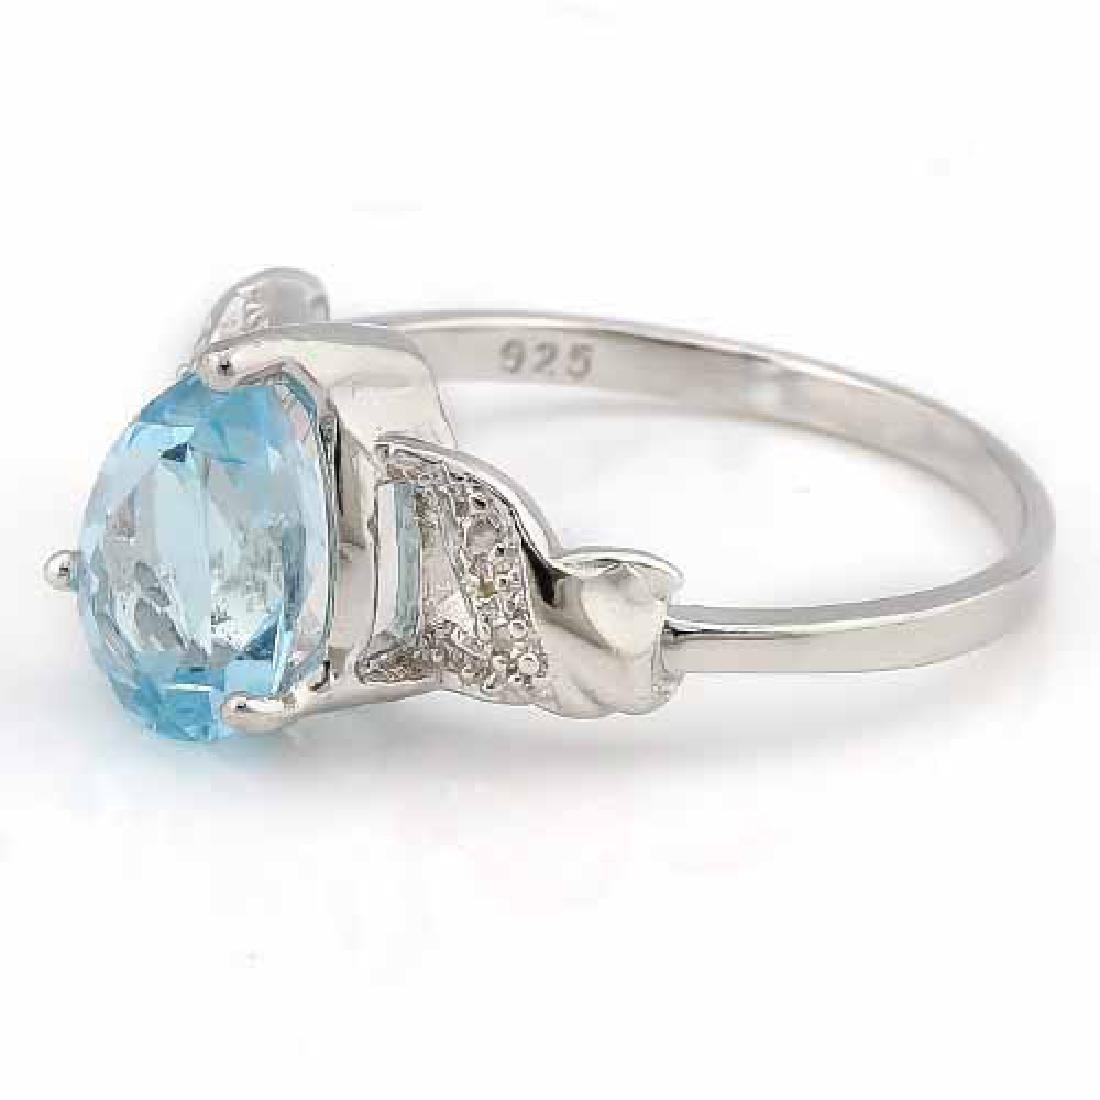 3 1/2 CARAT BABY SWISS BLUE TOPAZ & DIAMOND 925 STERLIN